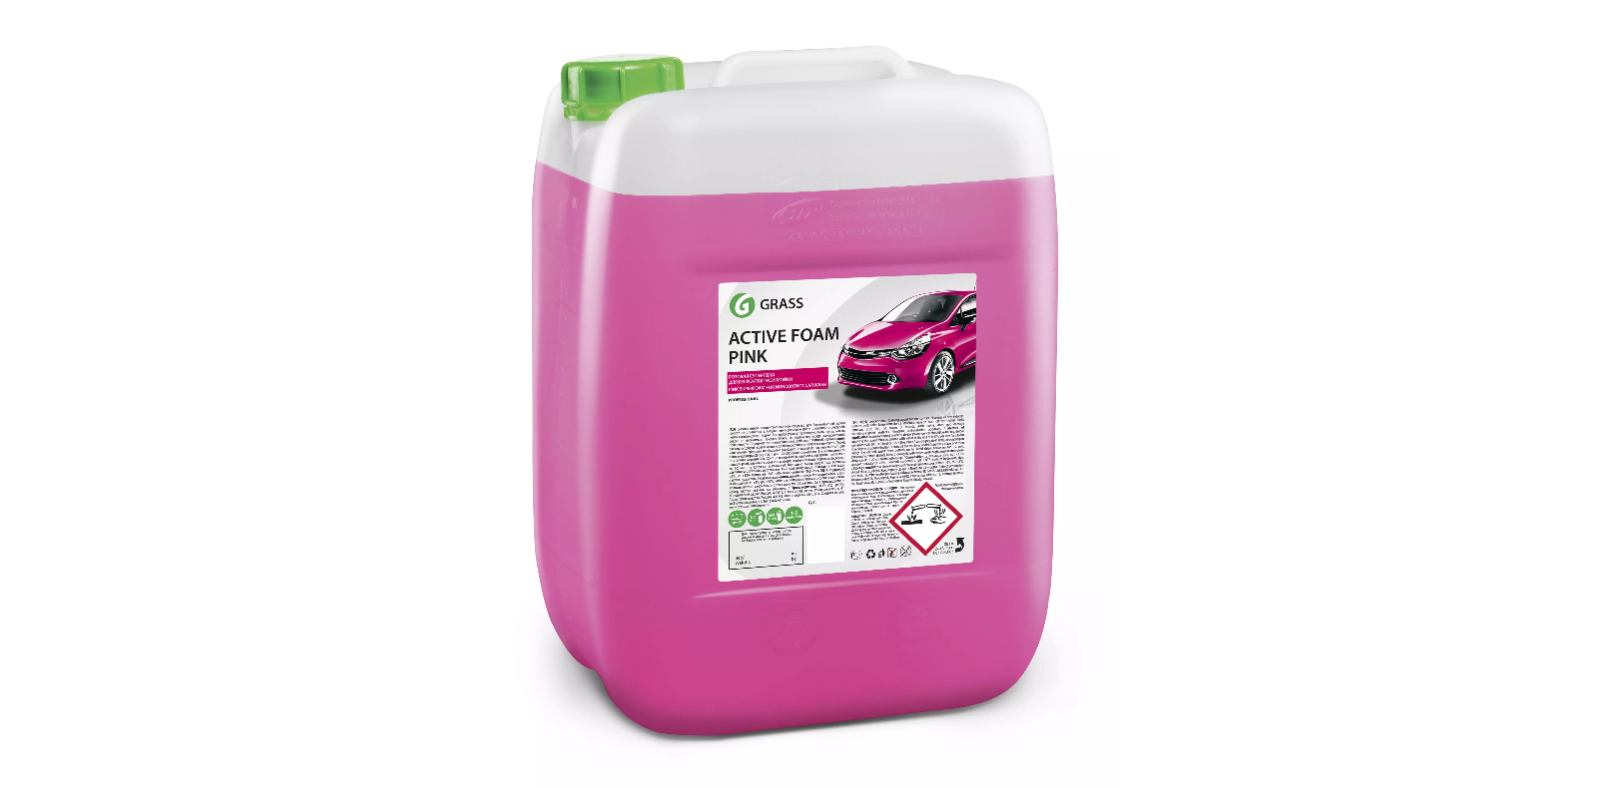 GRASS Активная розовая пена Active Foam Pink, 12л